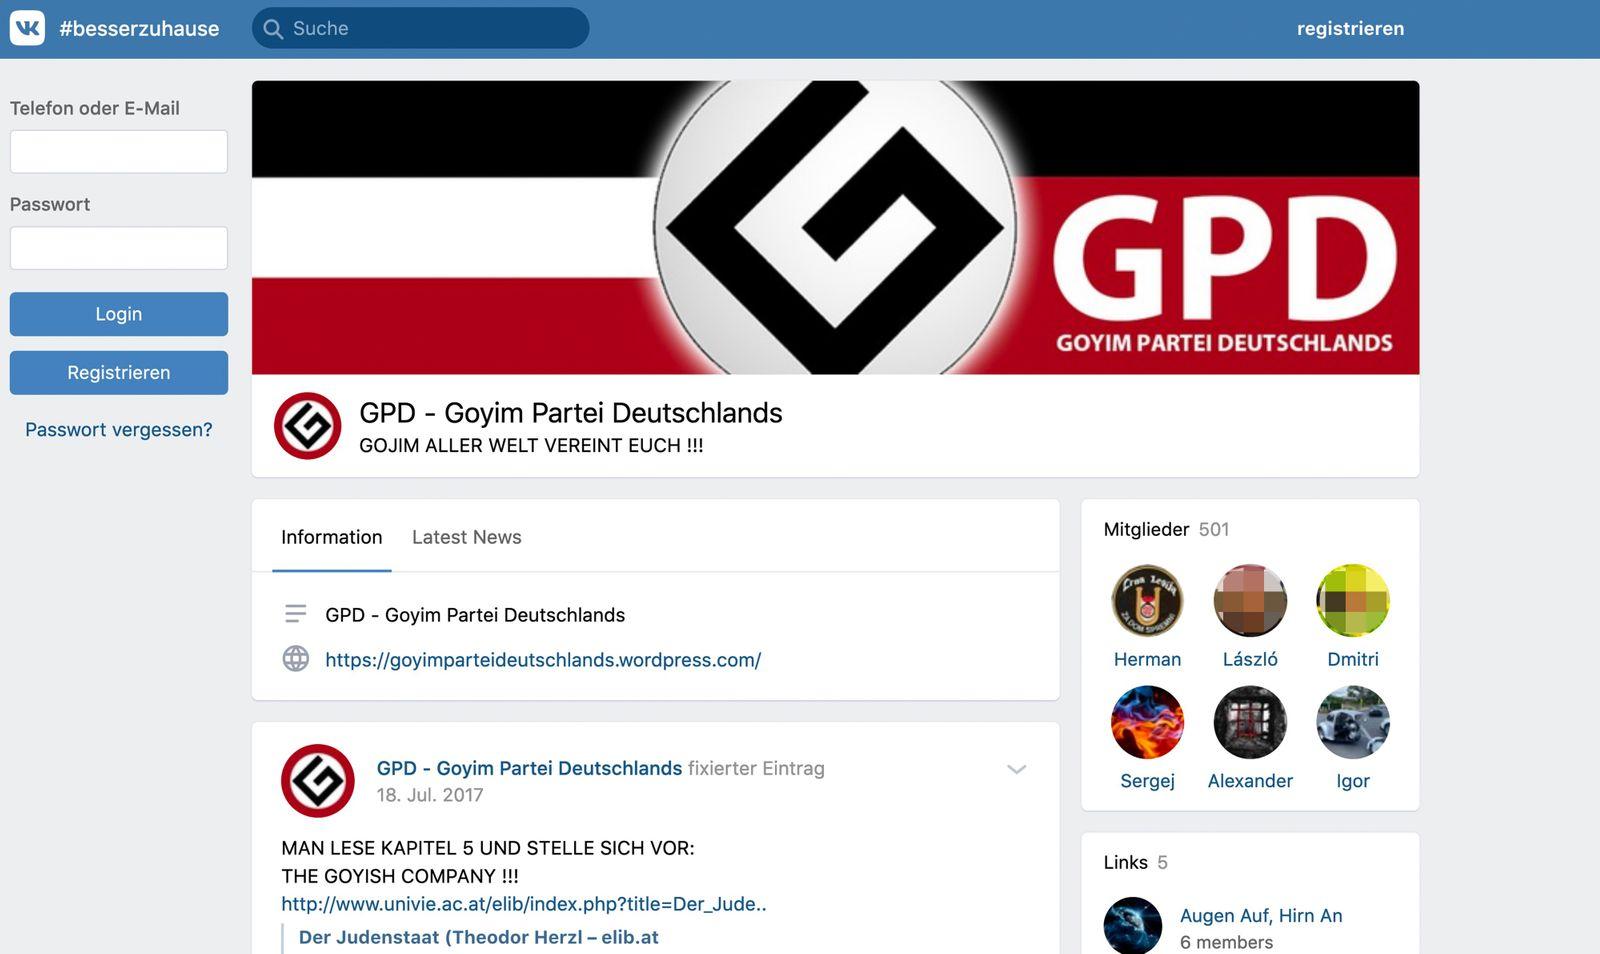 GPD - Goyim Partei Deutschlands SCREENSHOT